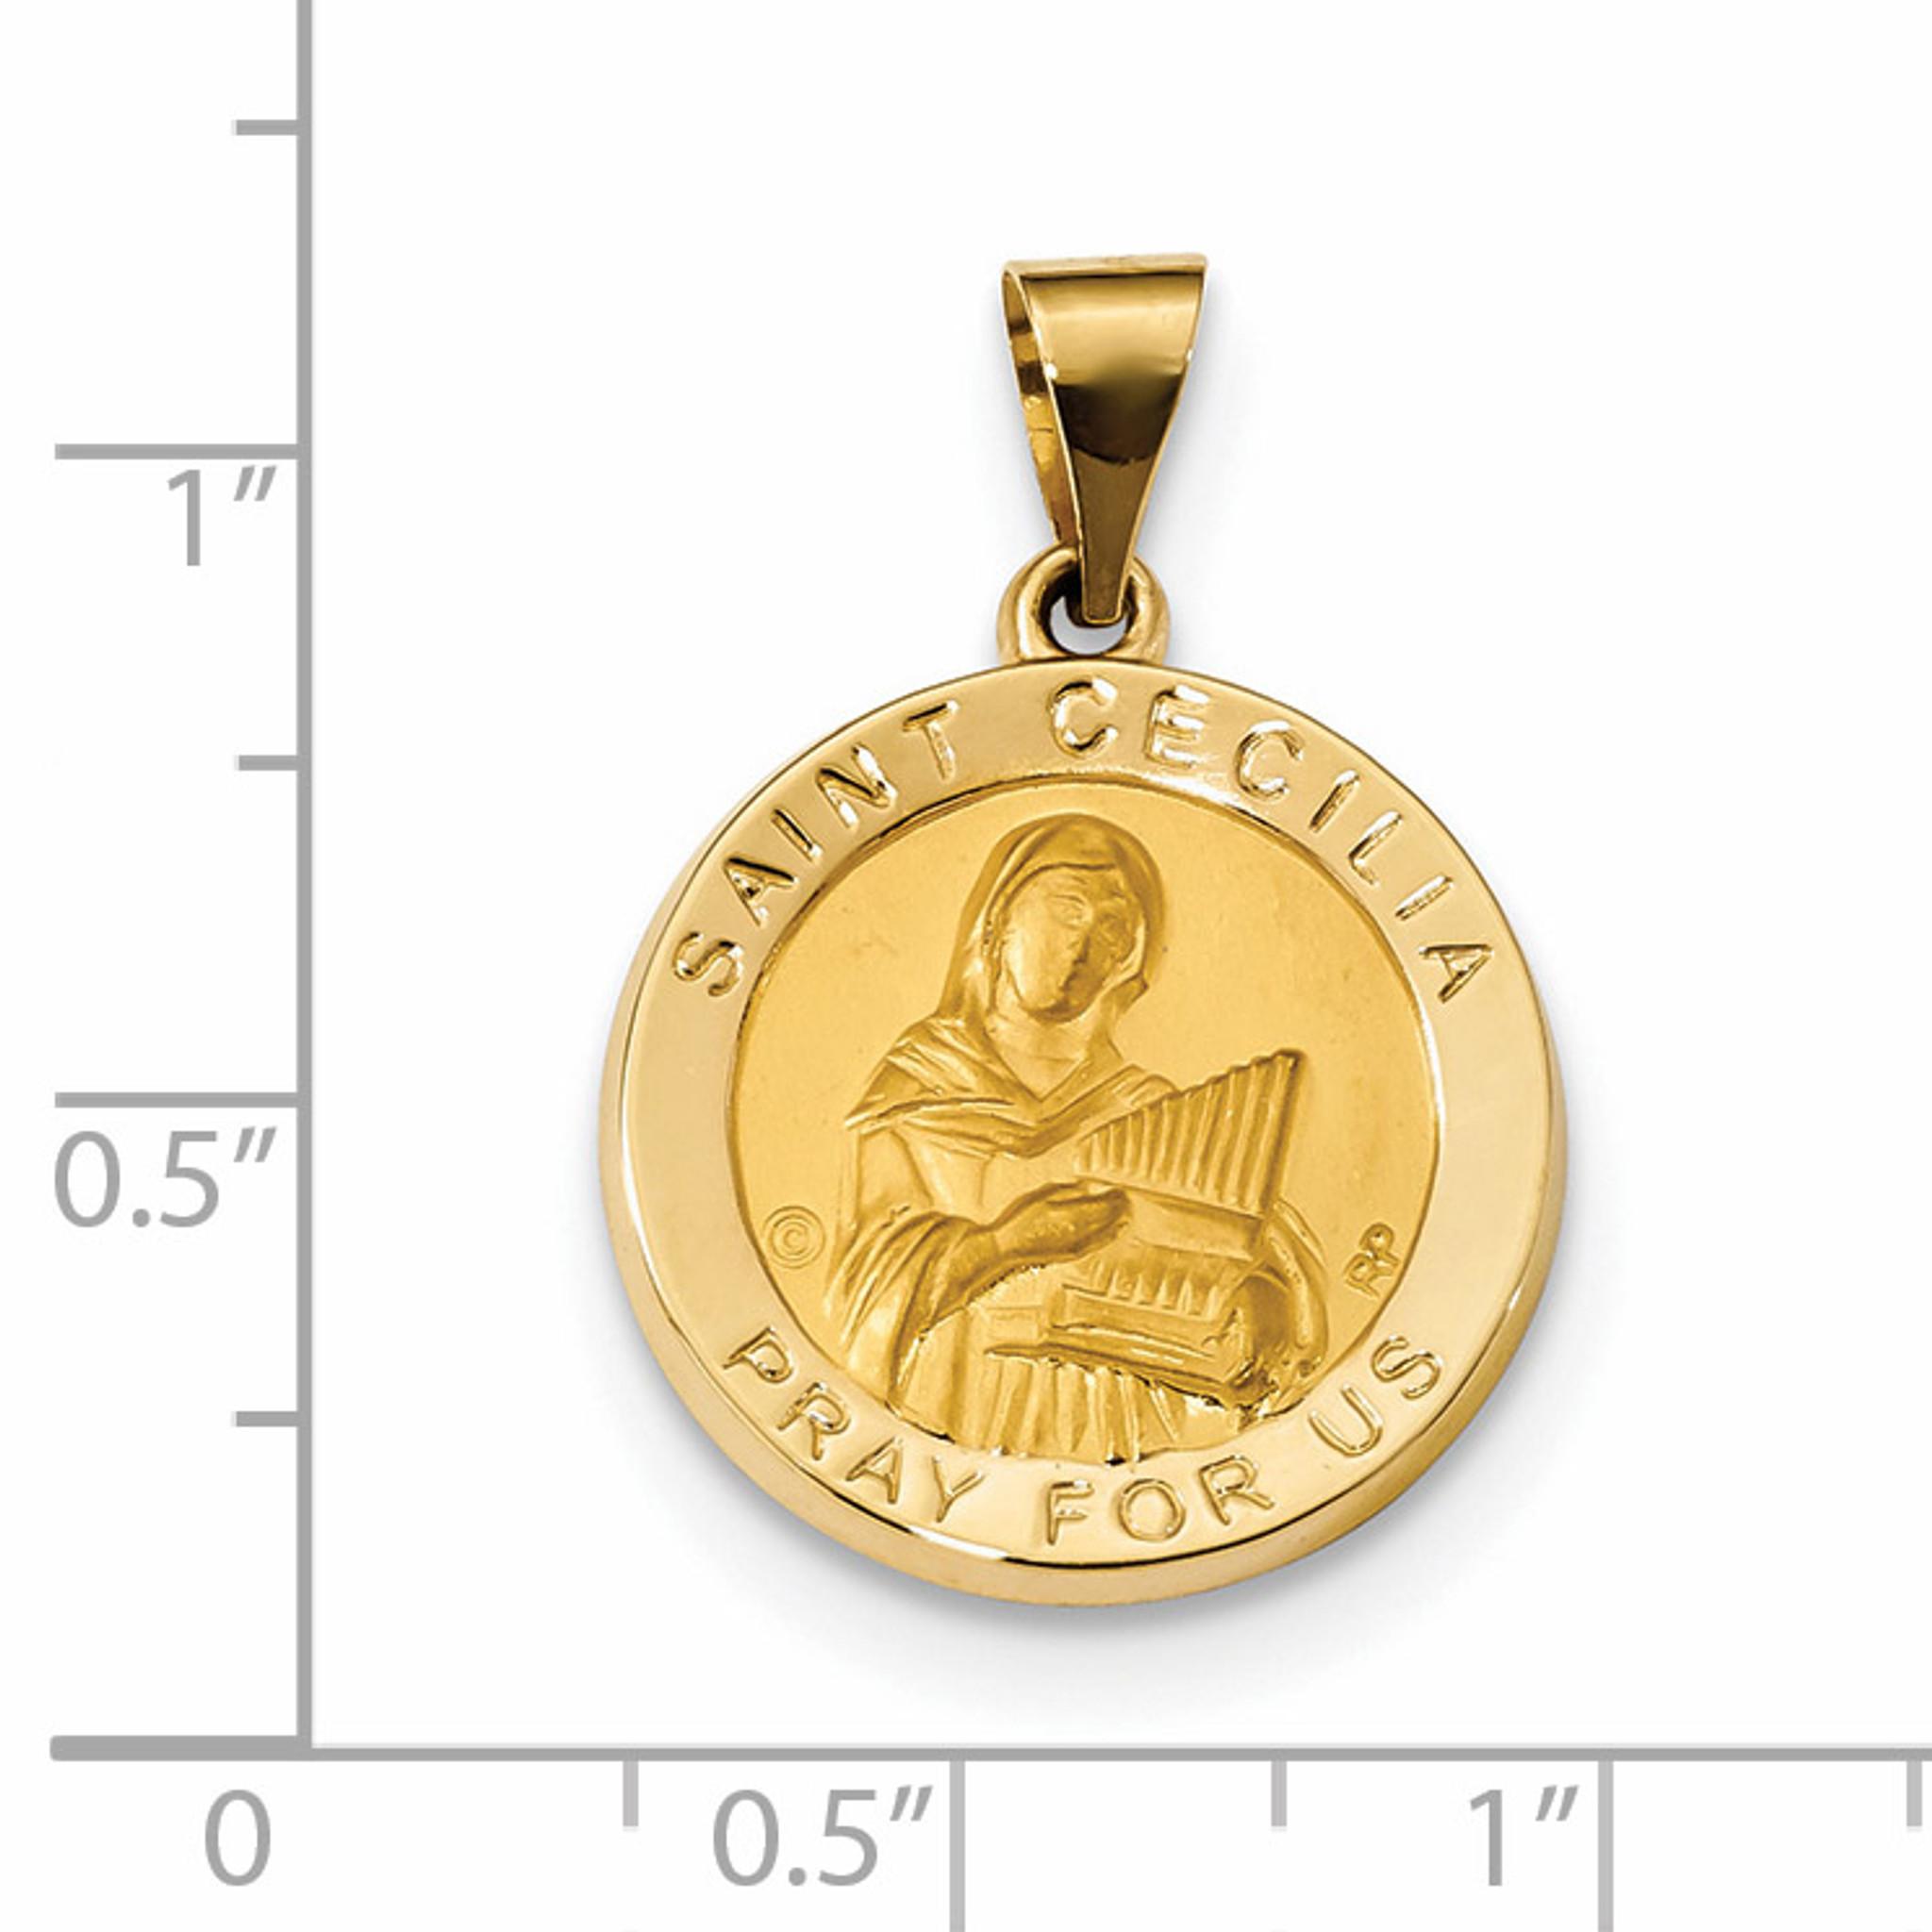 Satin saint cecilia hollow medal pendant 14k gold polished xr1683 satin saint cecilia hollow medal pendant 14k gold polished xr1683 aloadofball Image collections